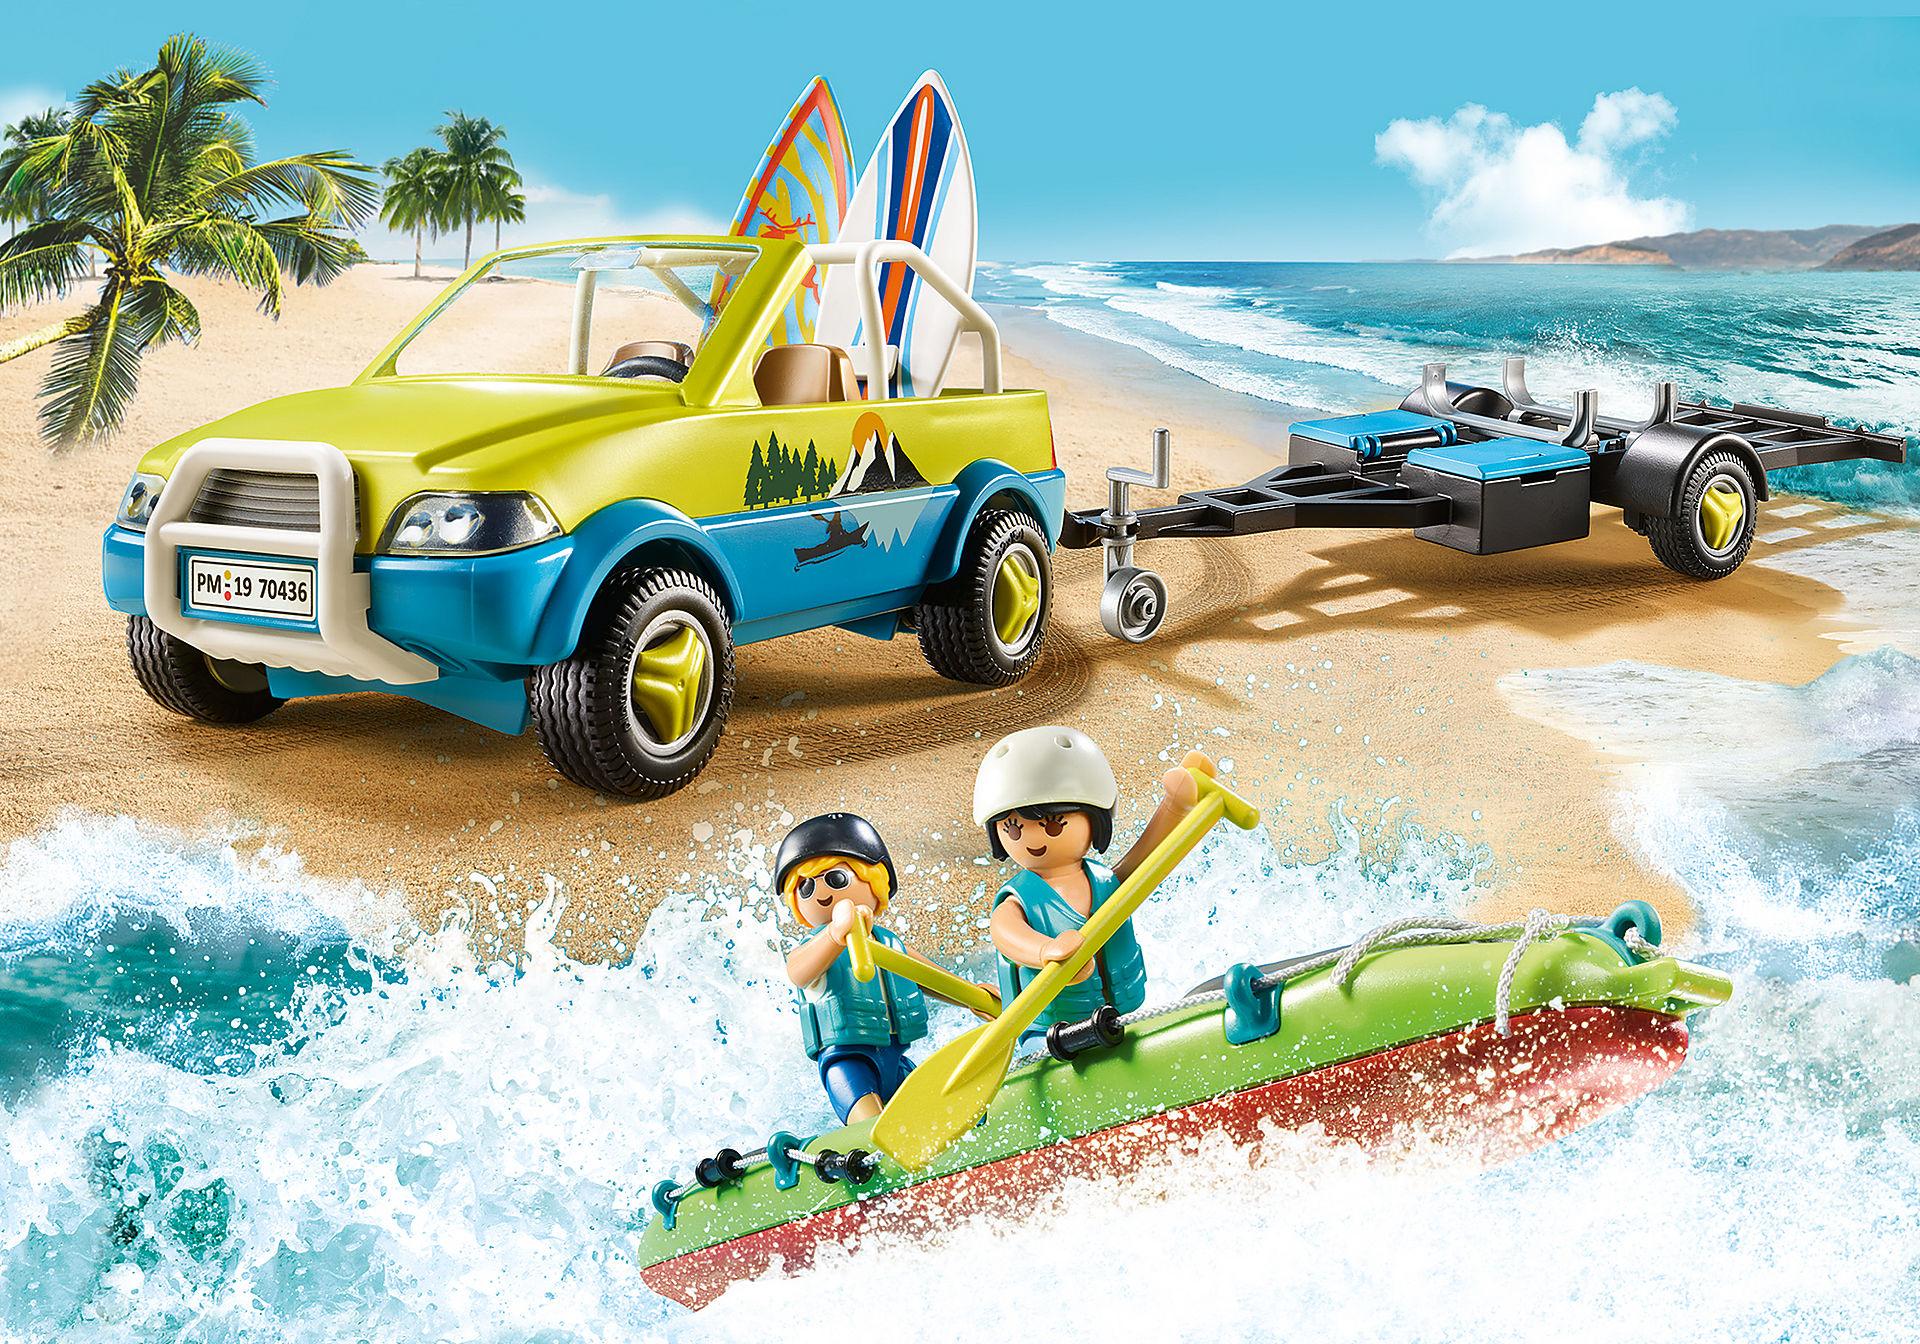 70436 Beach Car with Canoe zoom image1